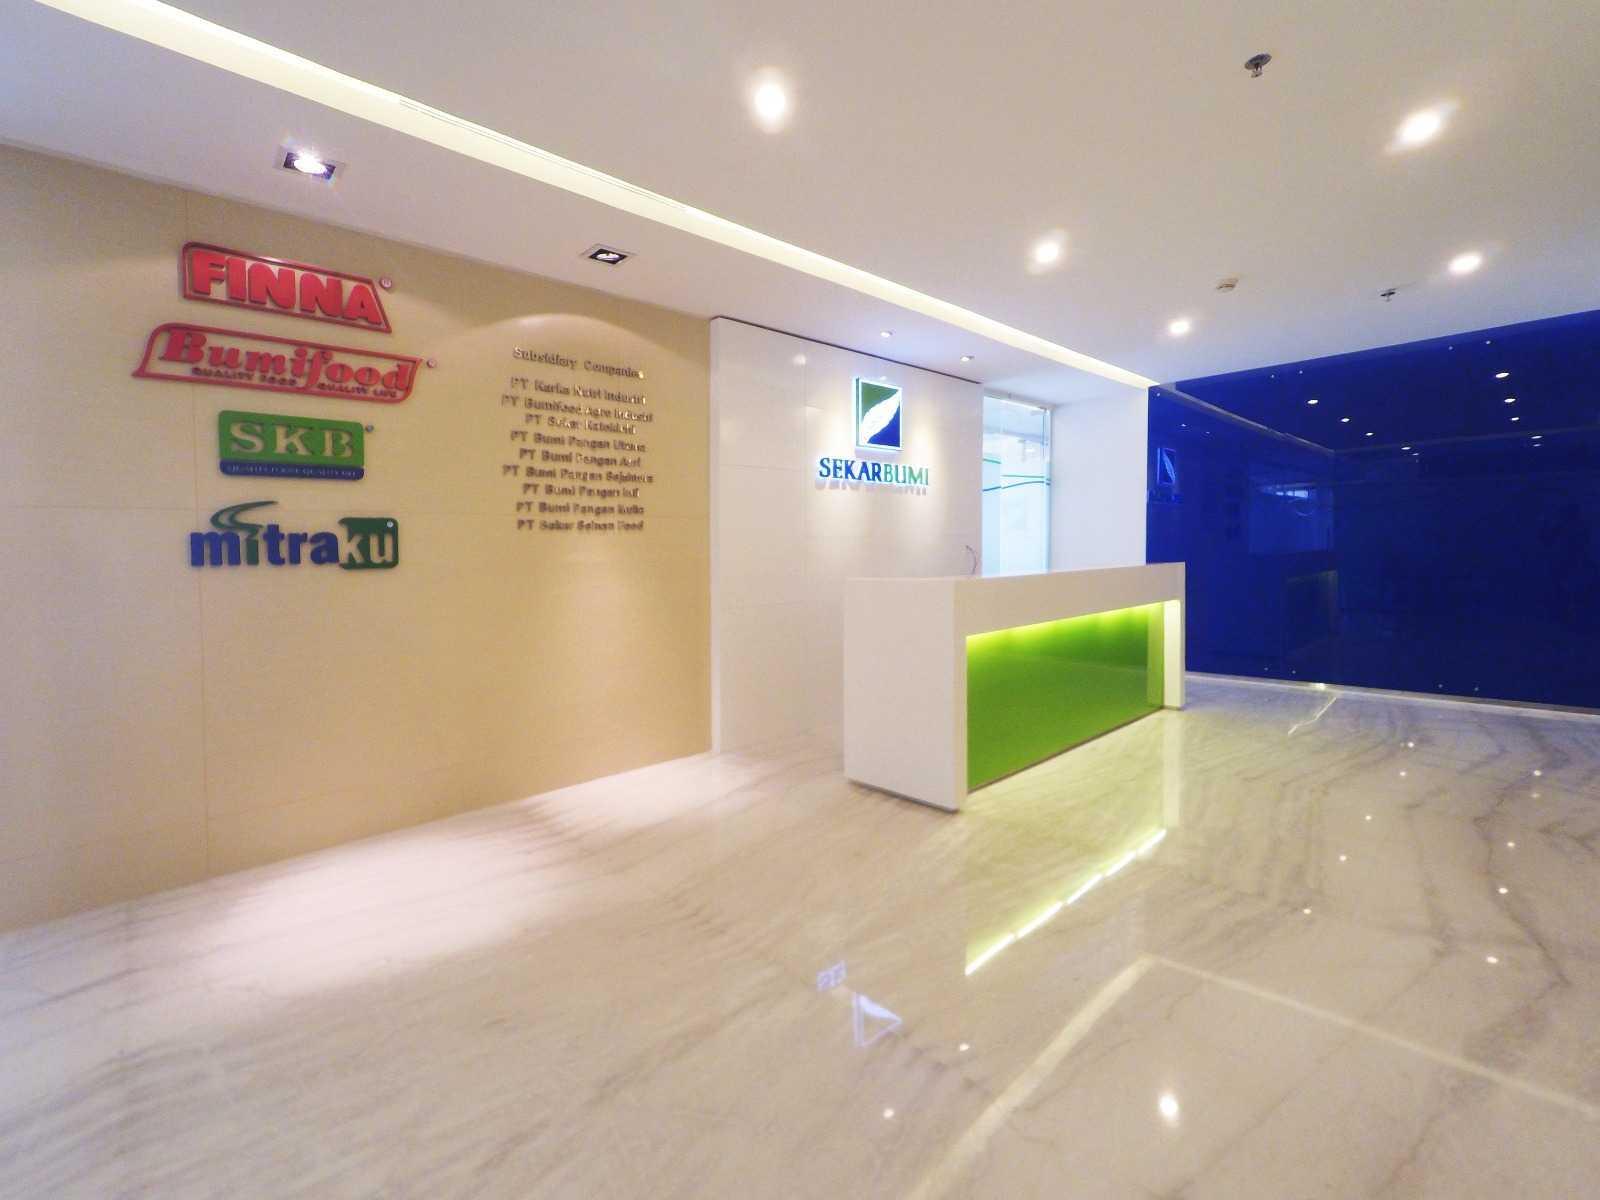 Arkadia Works Sekar Bumi Office Renovation Plaza Asia 21St Floor Plaza Asia 21St Floor Reception Area   14074